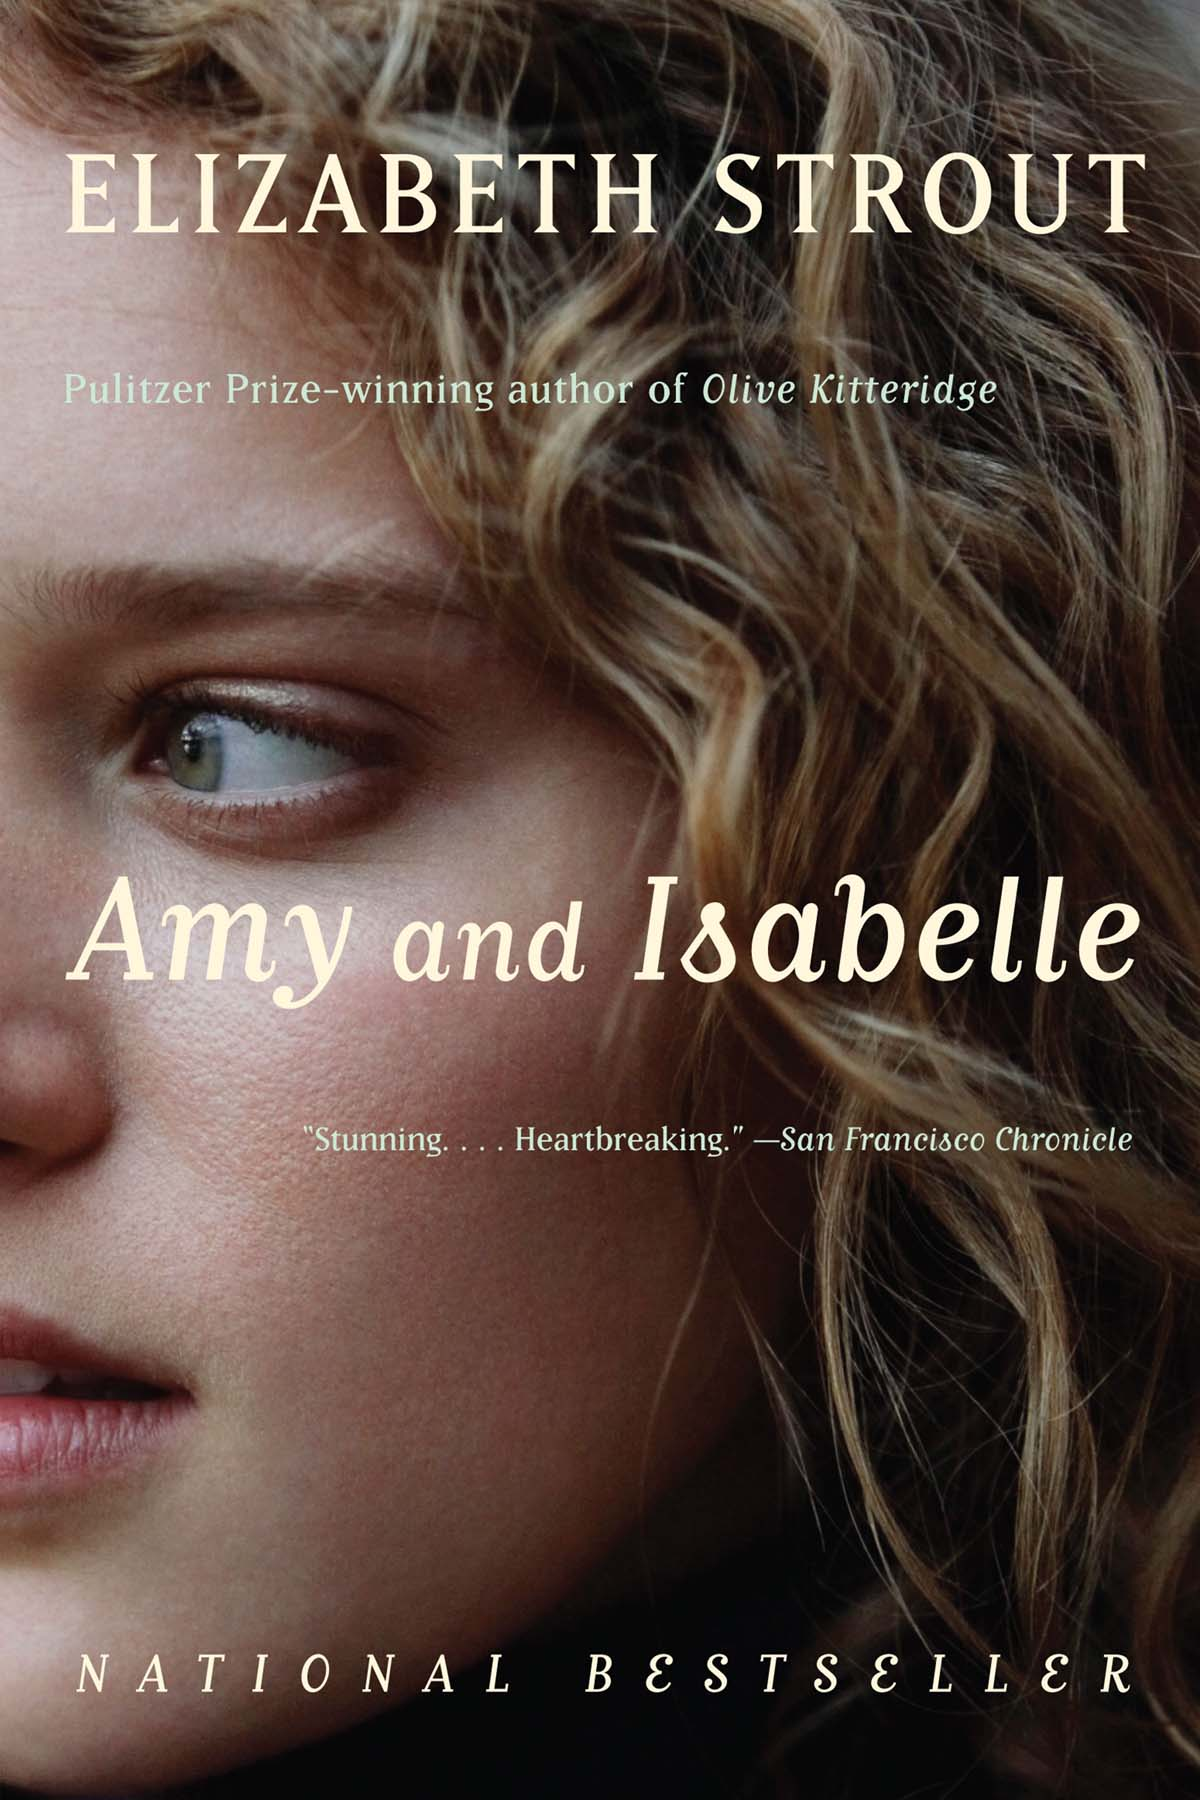 Amy and IsabelleA NOVELBy ELIZABETH STROUTCR: Vintage